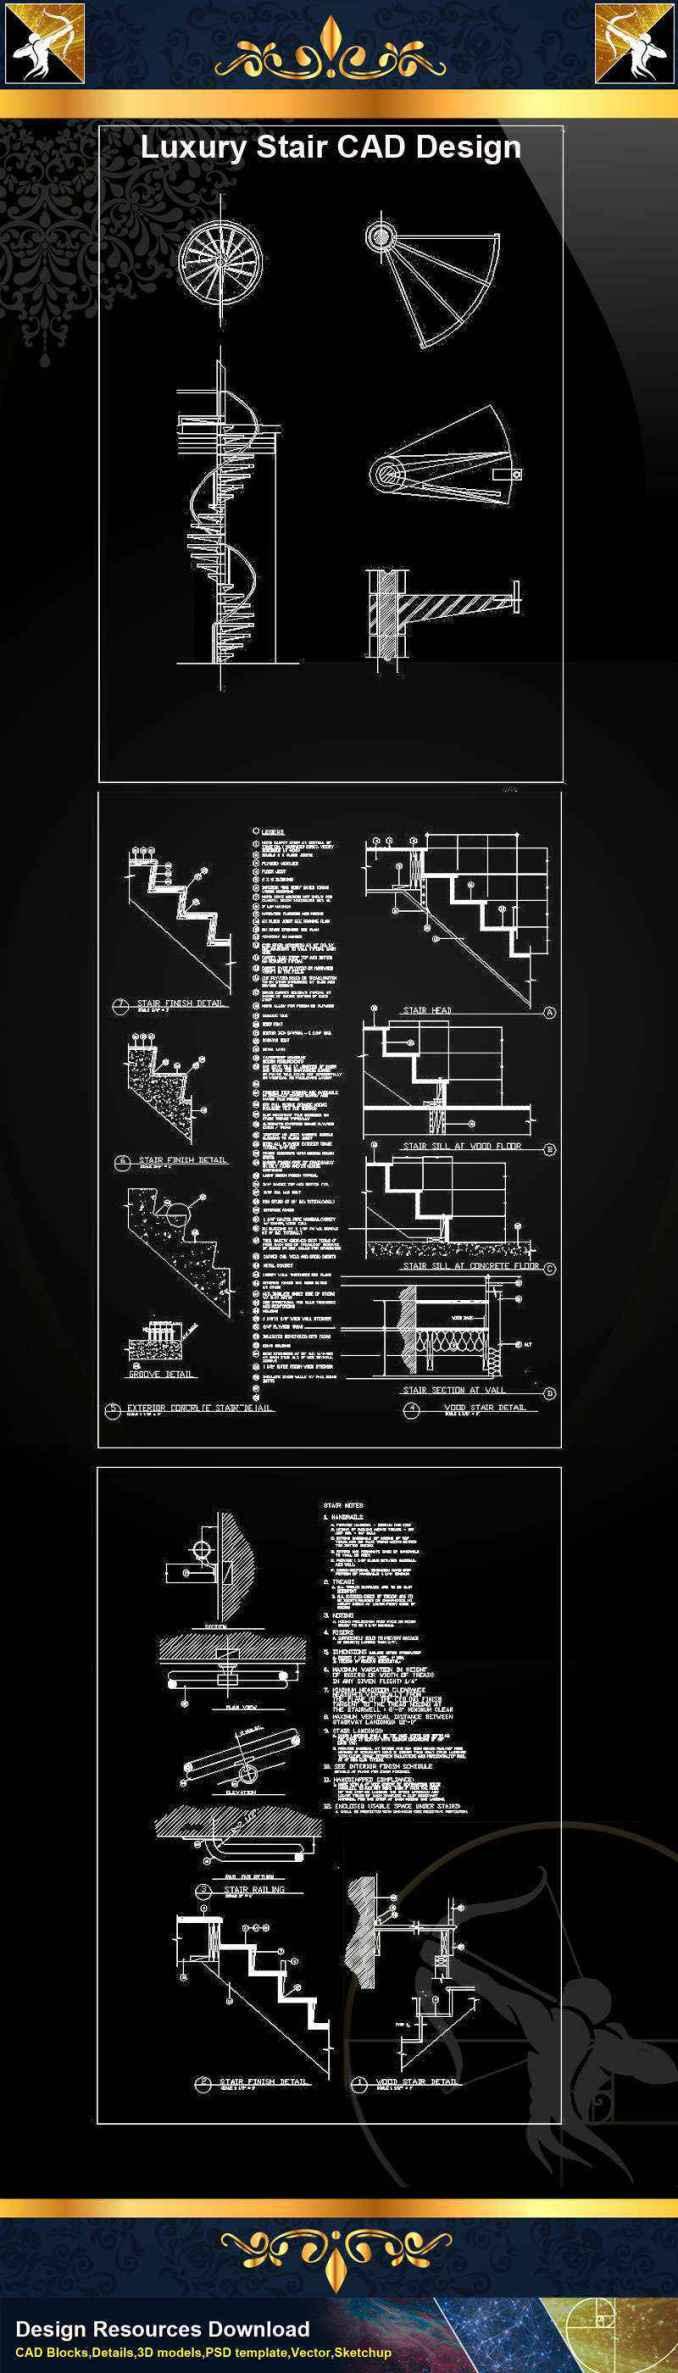 ★【Architecture Decoration Design Element CAD Blocks V.7-Door & Window】@Autocad Decoration Blocks,Drawings,CAD Details,Elevation